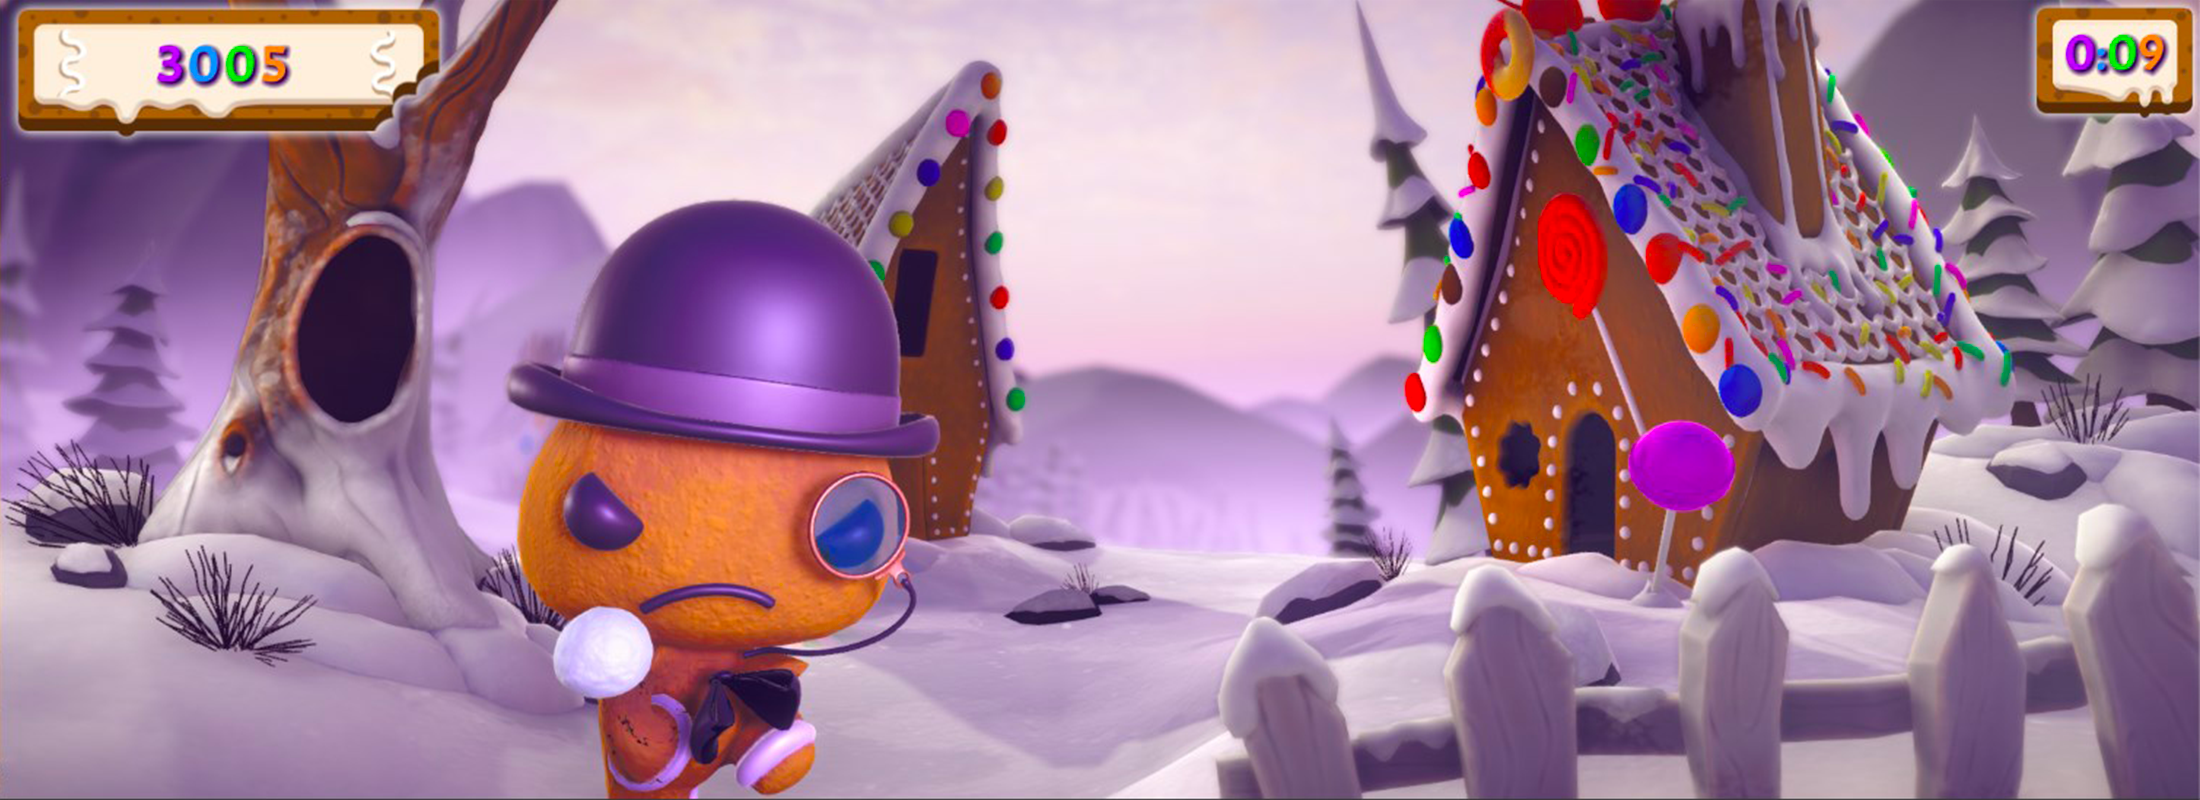 Winter mayhem gameplay picture boss